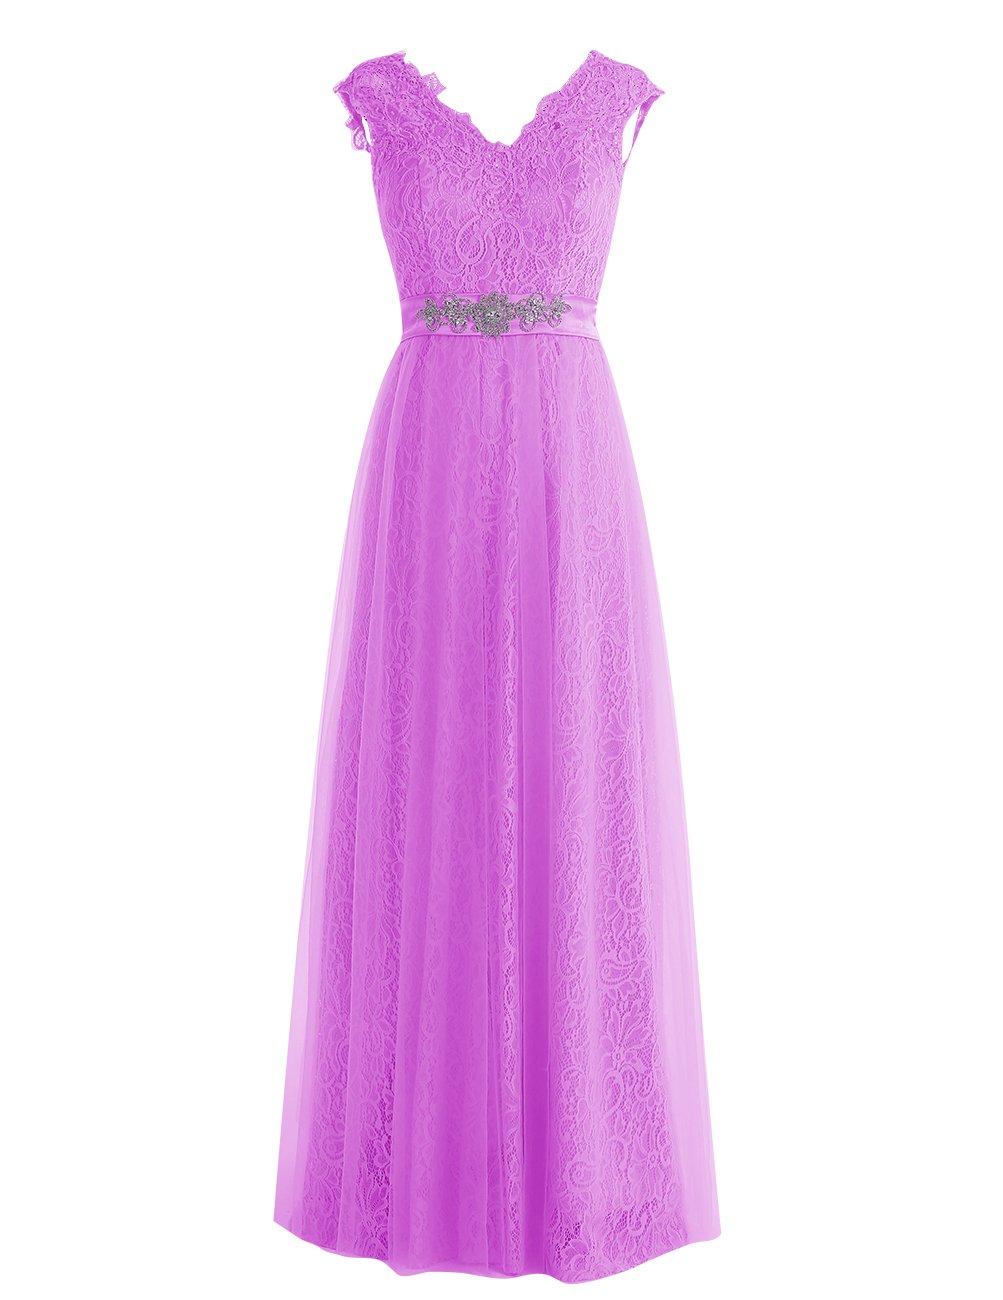 Dresstell レディーズ ロング丈 披露宴ドレス 結婚式ドレス 総レースのお呼ばれ フォーマルドレス キラキラビジュー付き ビスチェタイプ 編み上げの花嫁ワンピース 二次会ドレス ステージドレス B01LWWVXAG JP17 ペールパープル ペールパープル JP17